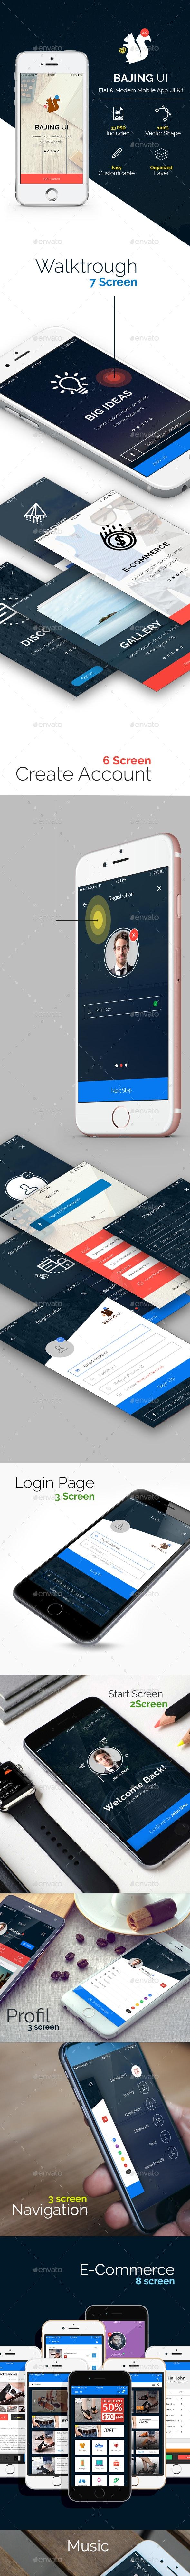 Bajing UI - Mobile App UI Kit v2.0 - User Interfaces Web Elements